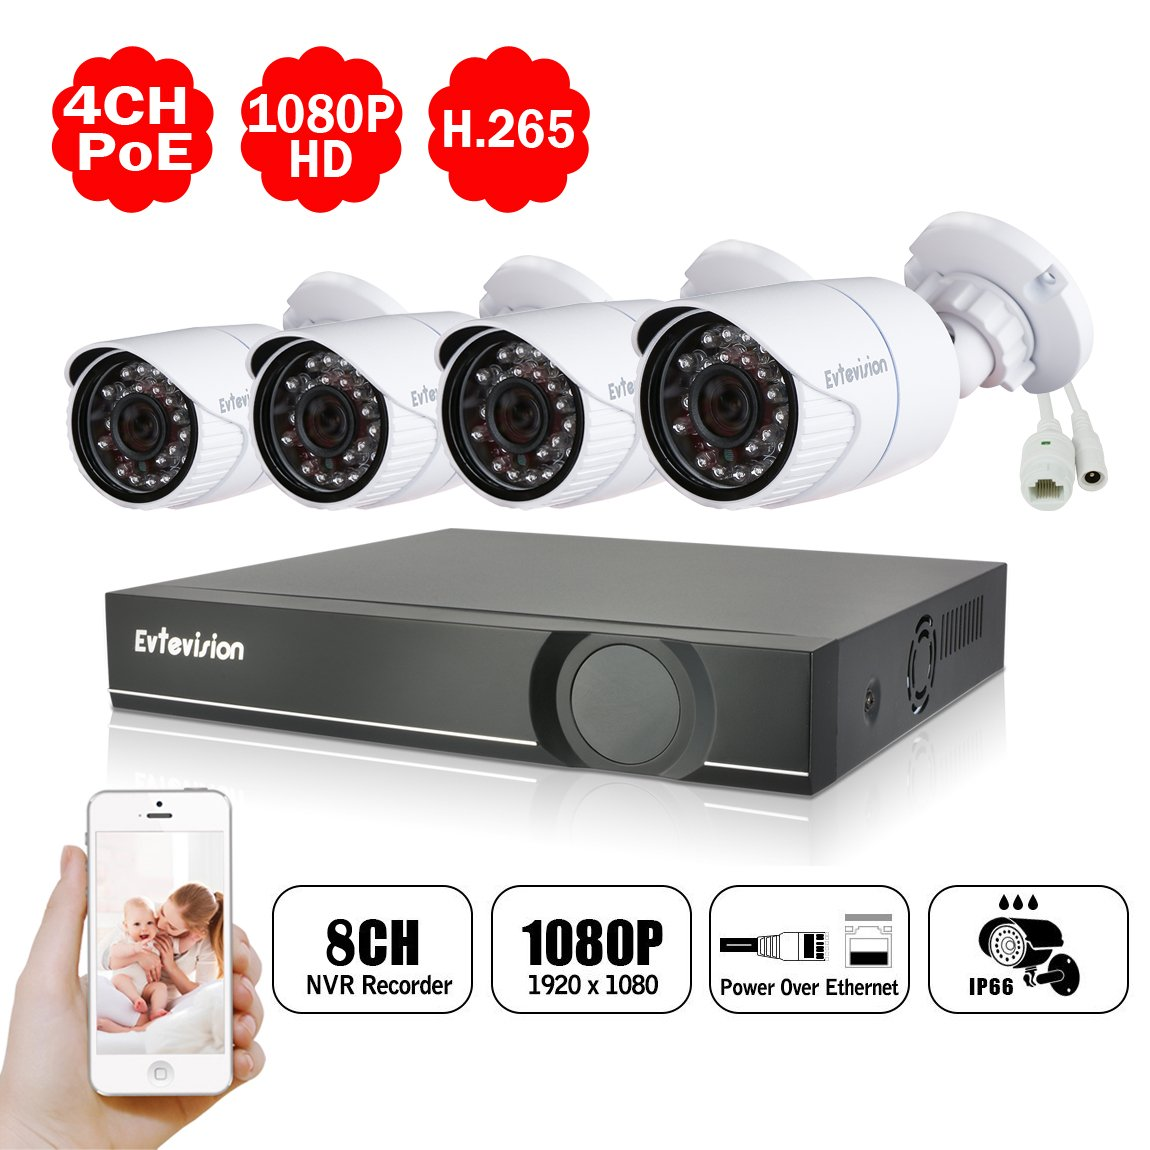 Evtevision 防犯カメラセット 監視カメラ4台 8チャンネル 録画機(NVR) H.265 ネットワークレコーダー 1080P 200万画素 POE給電 IR CUT内蔵 防水仕様 遠隔監視対応 日本語システム(HDDなし) 屋内屋外兼用 ブラック B07BDJJ8S7 POE NVR+4台200万画素POE IPC(HDDなし) POE NVR+4台200万画素POE IPC(HDDなし)